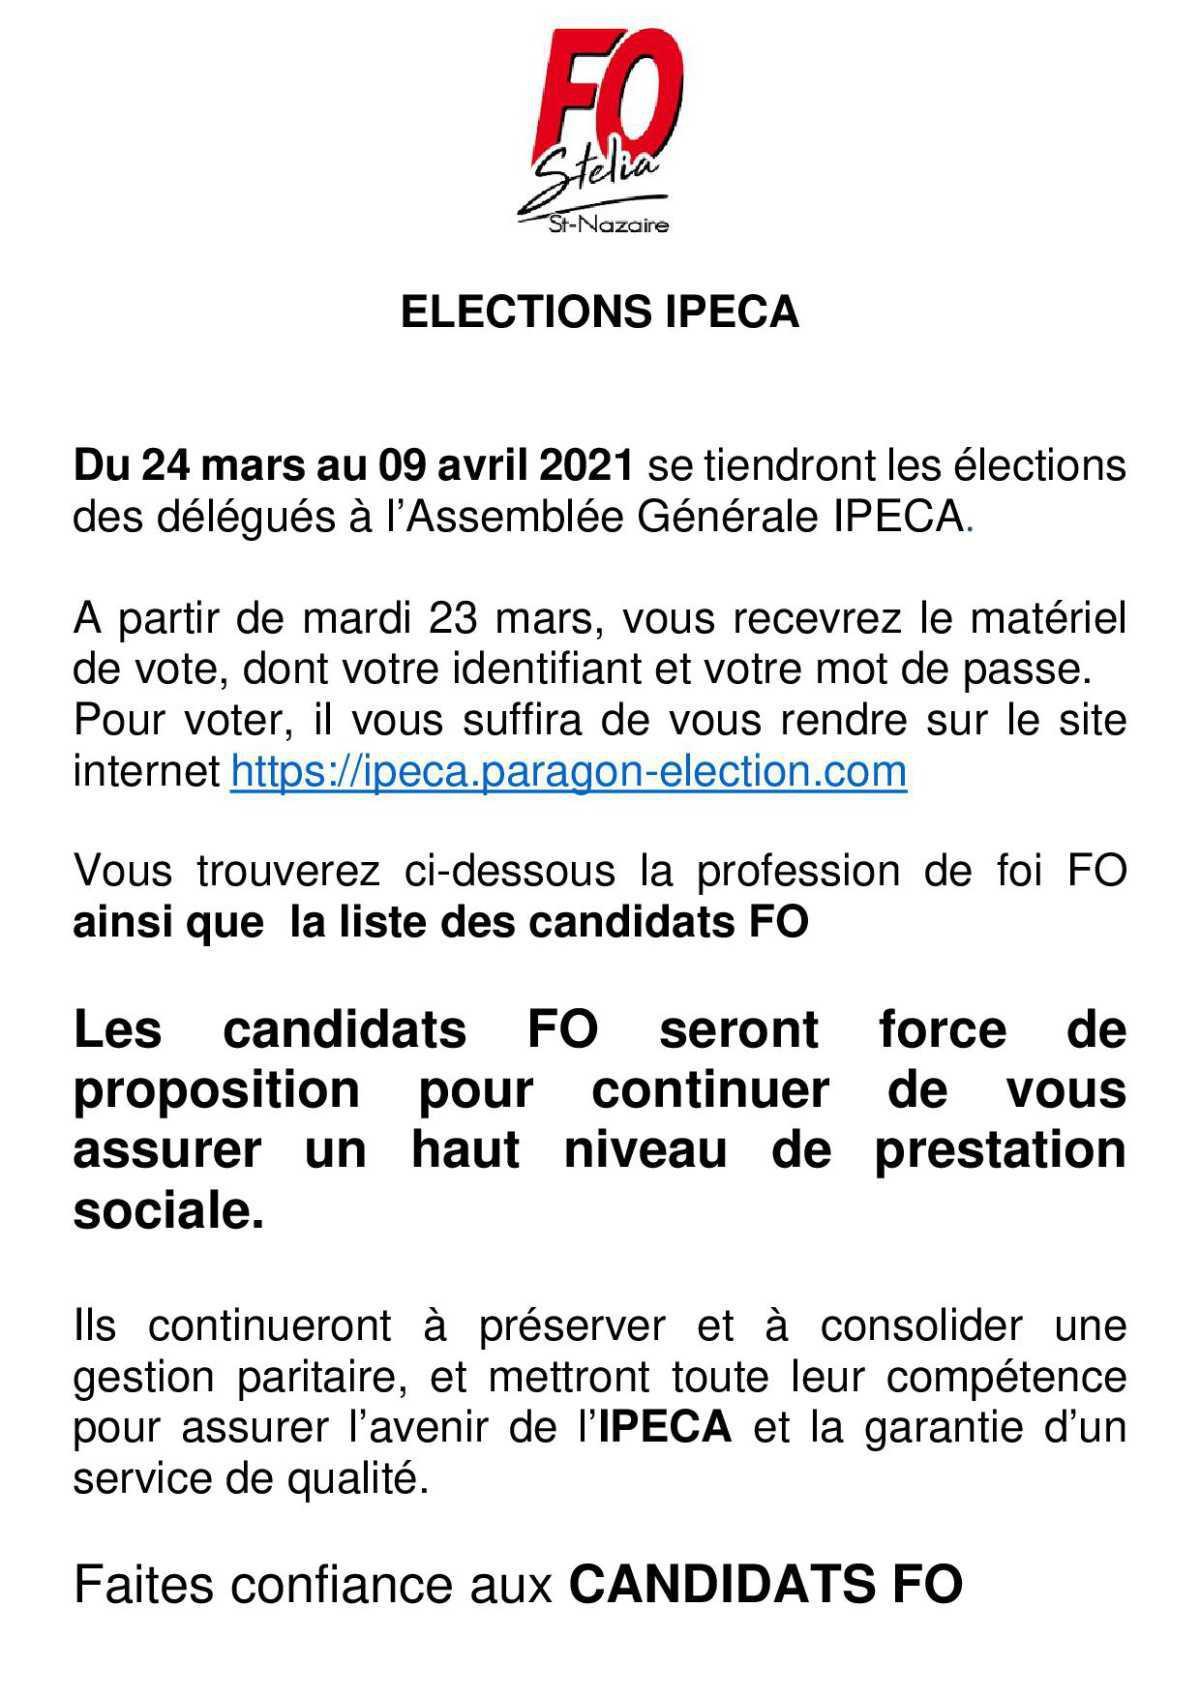 ELECTIONS IPECA